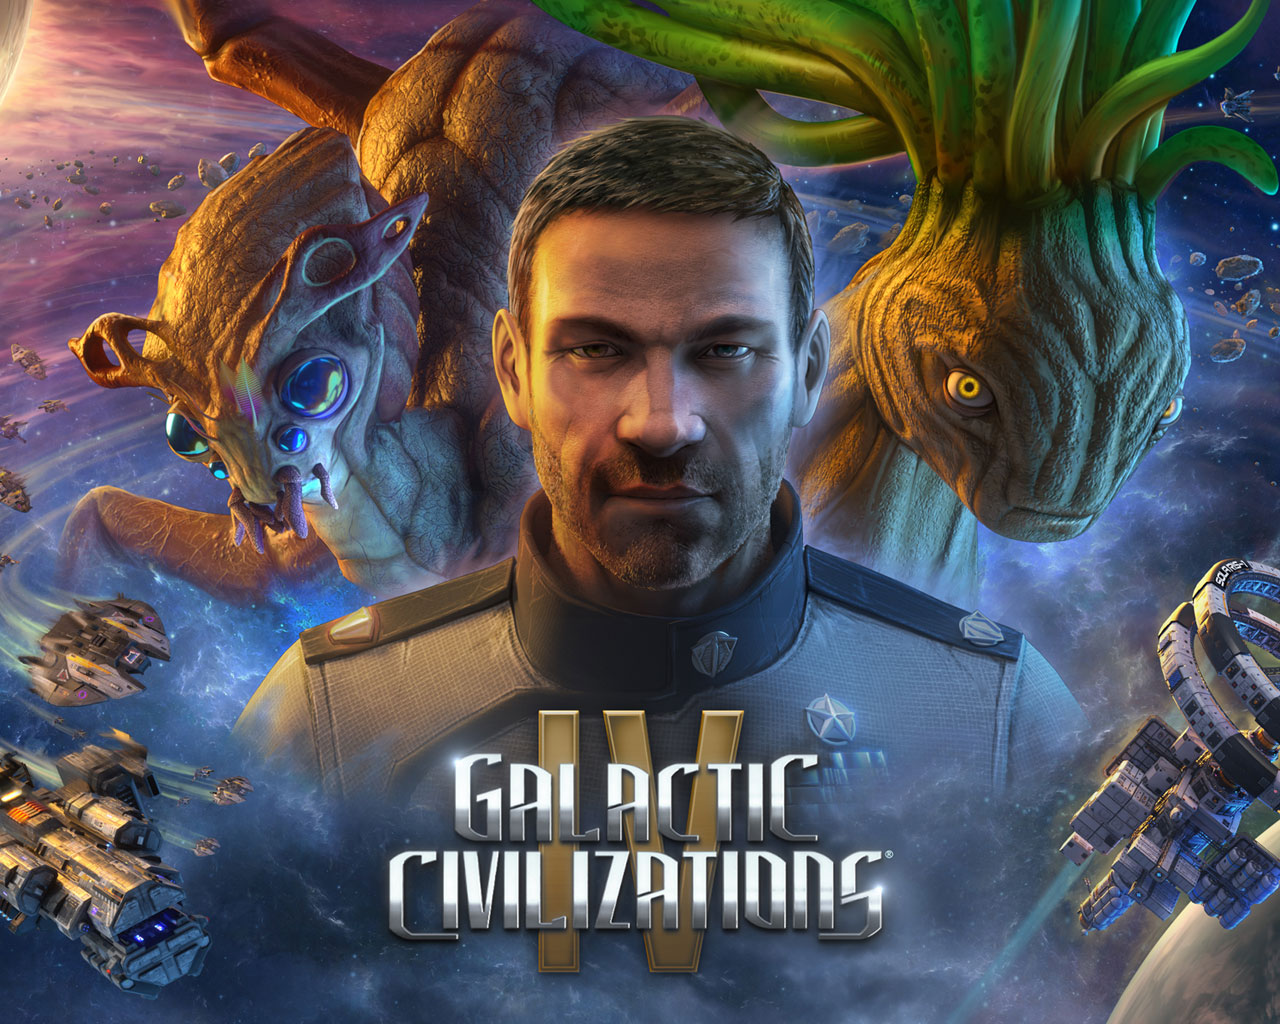 Free Galactic Civilizations IV Wallpaper in 1280x1024